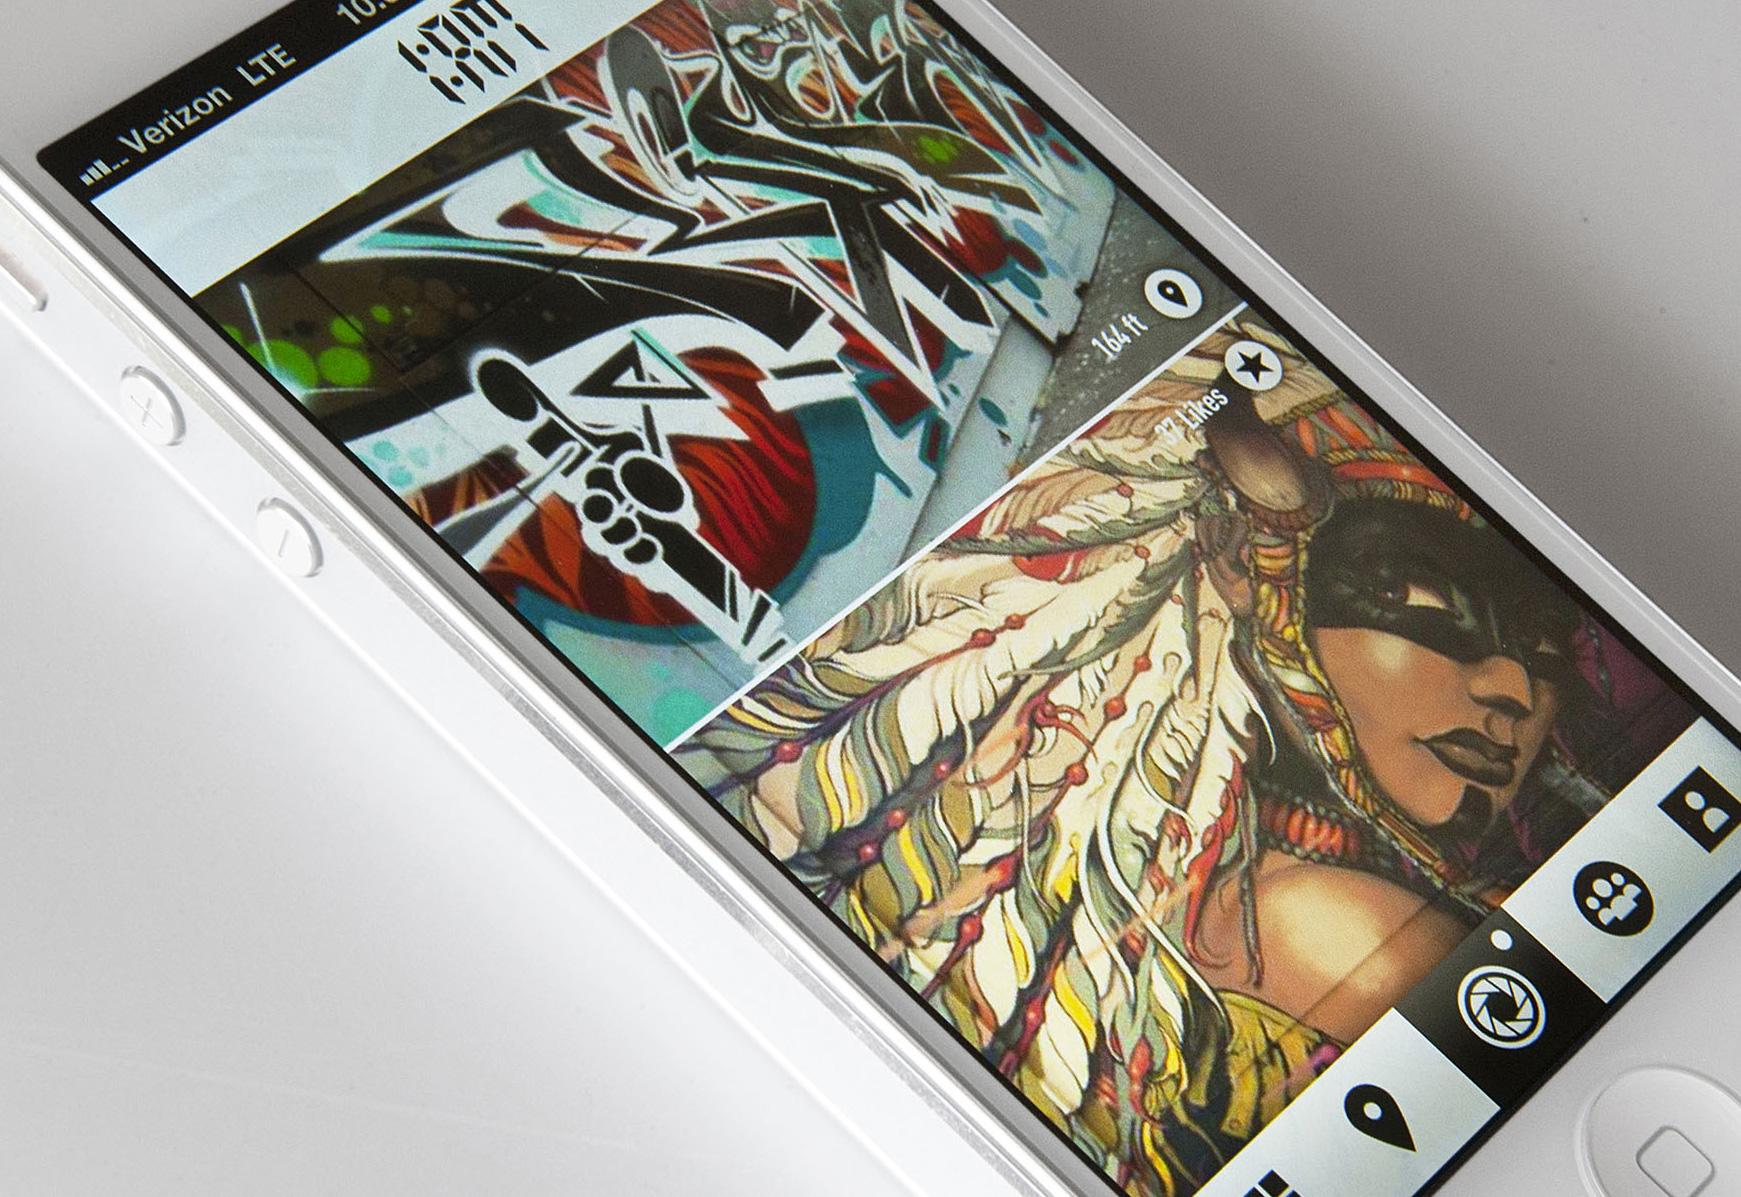 1:am app displayed on smartphone